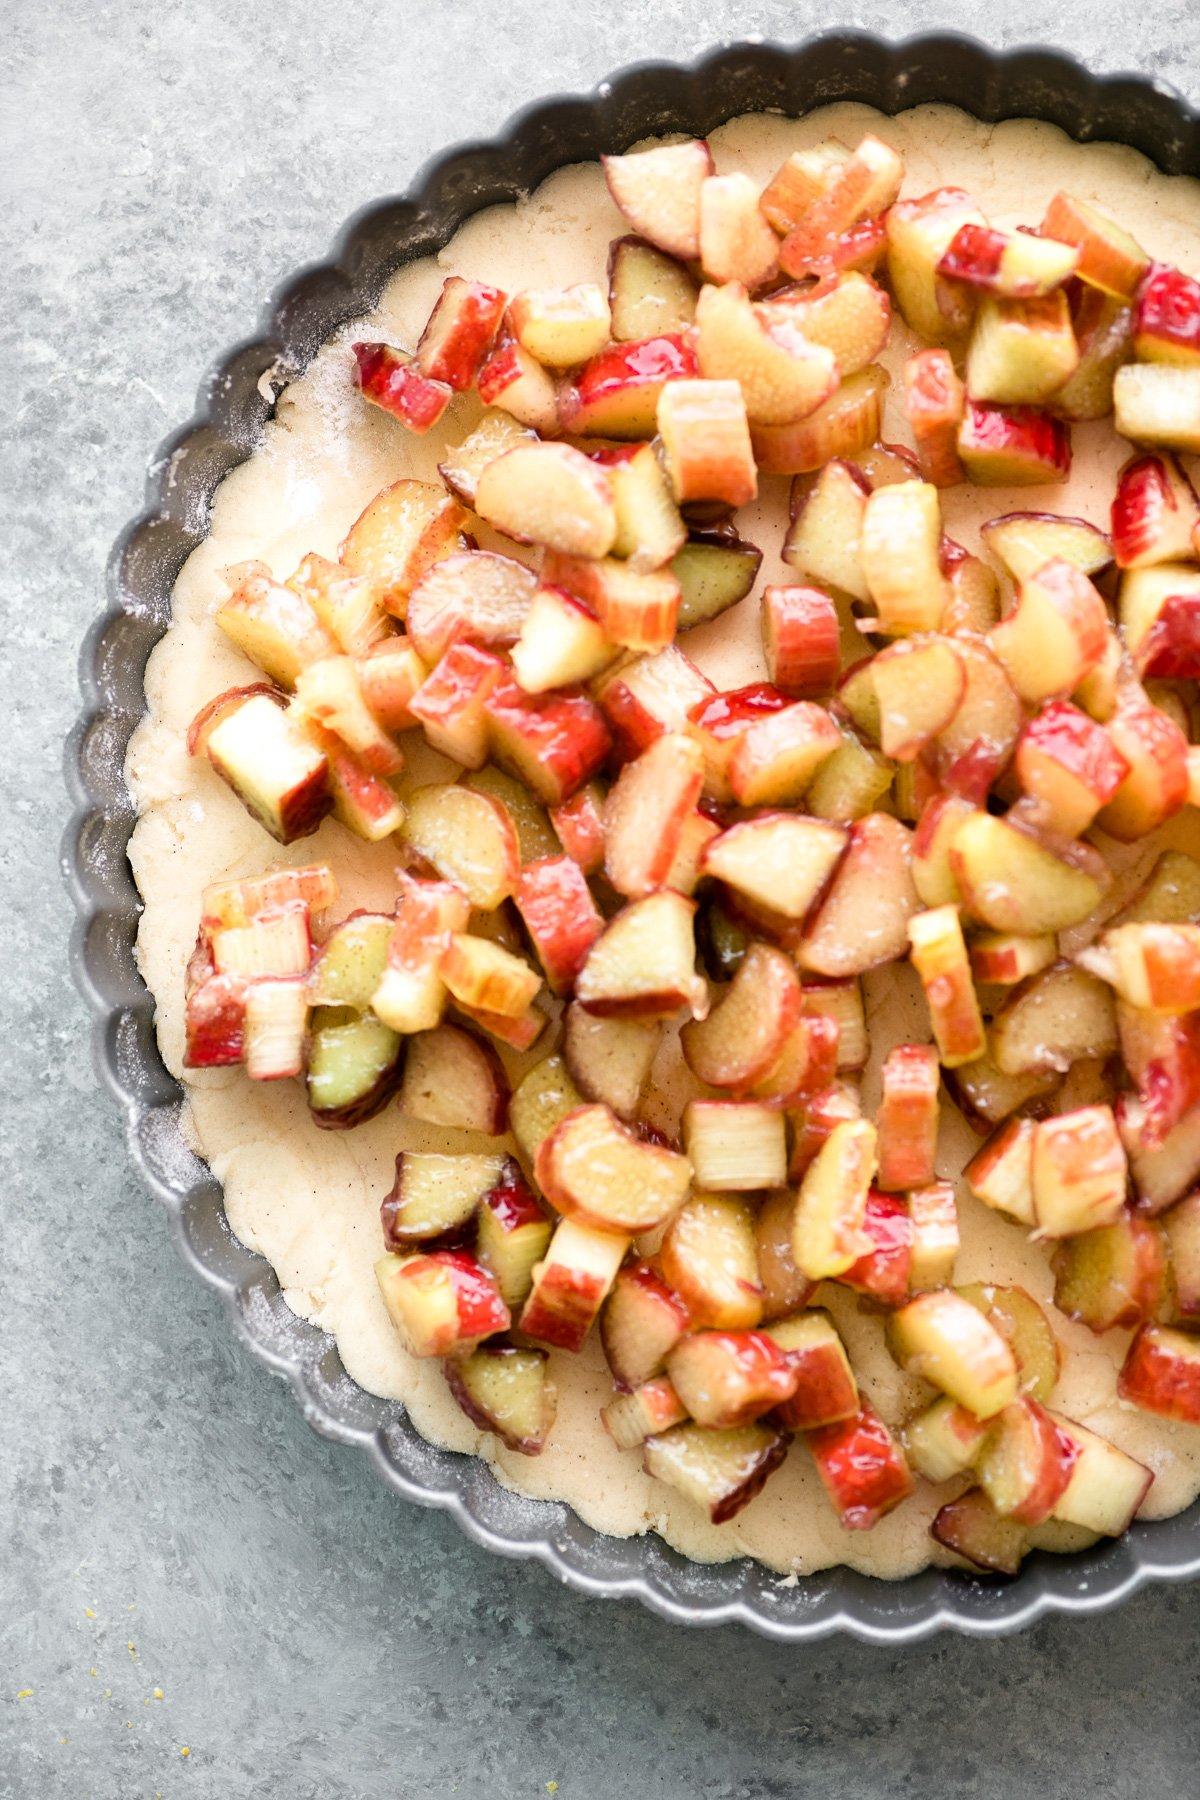 Assembling a rhubarb shortbread crumble tart